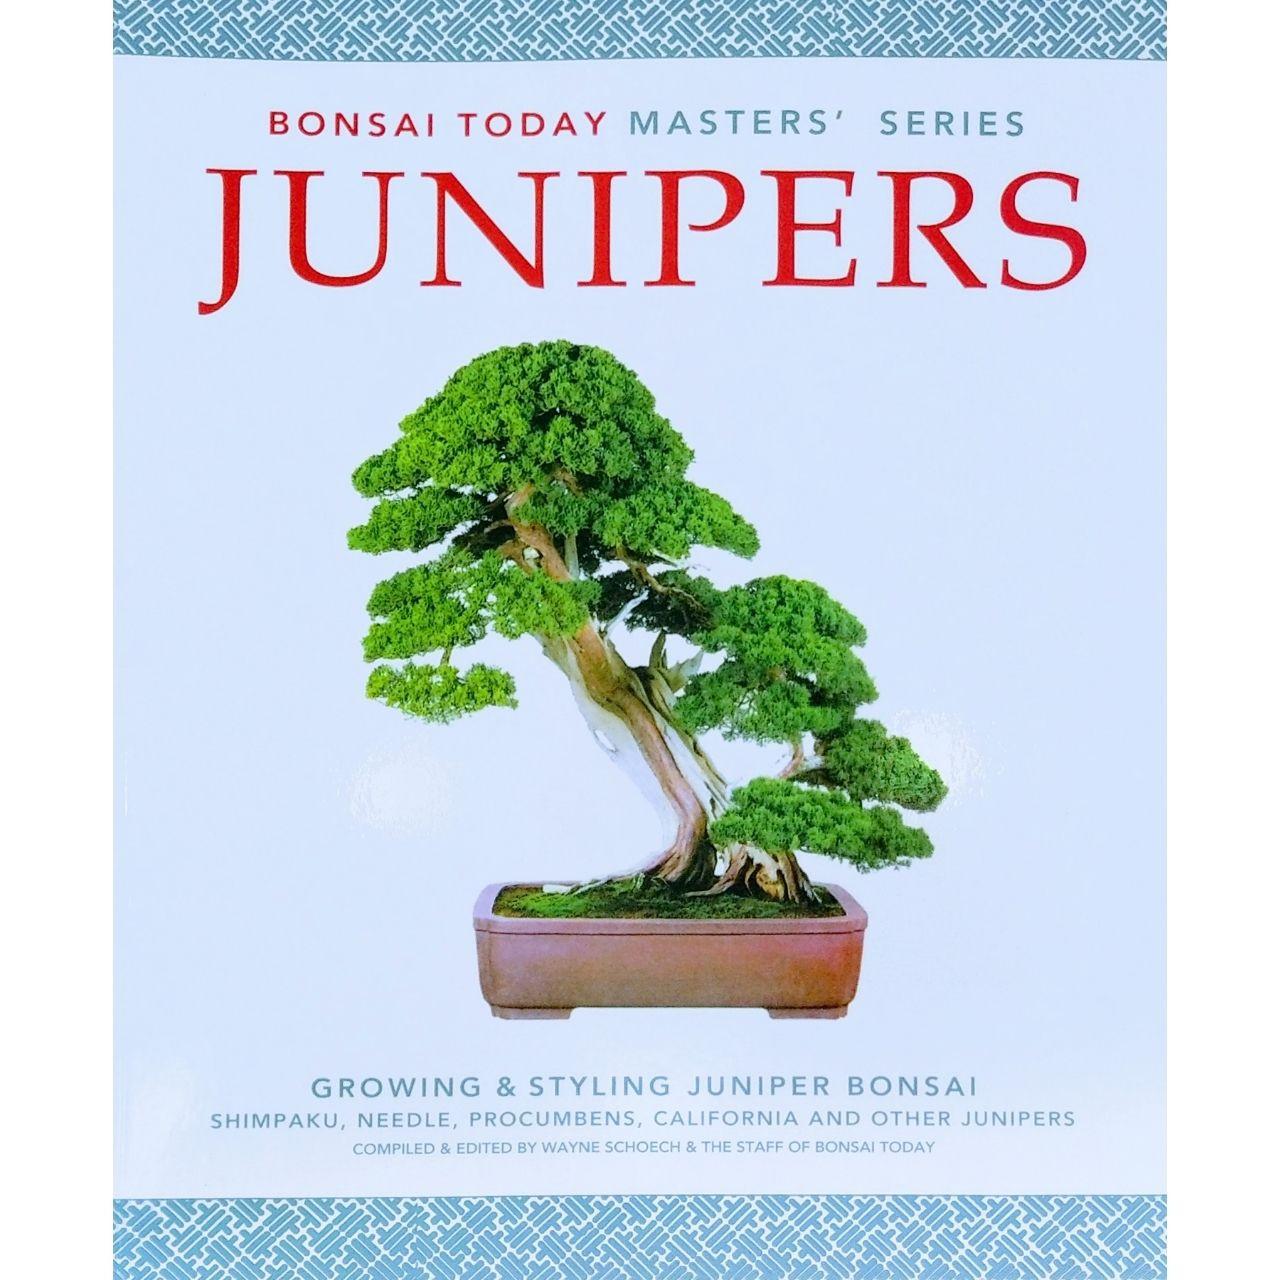 Junipers Growing And Styling Juniper Bonsai Book At Bonsaioutlet Com